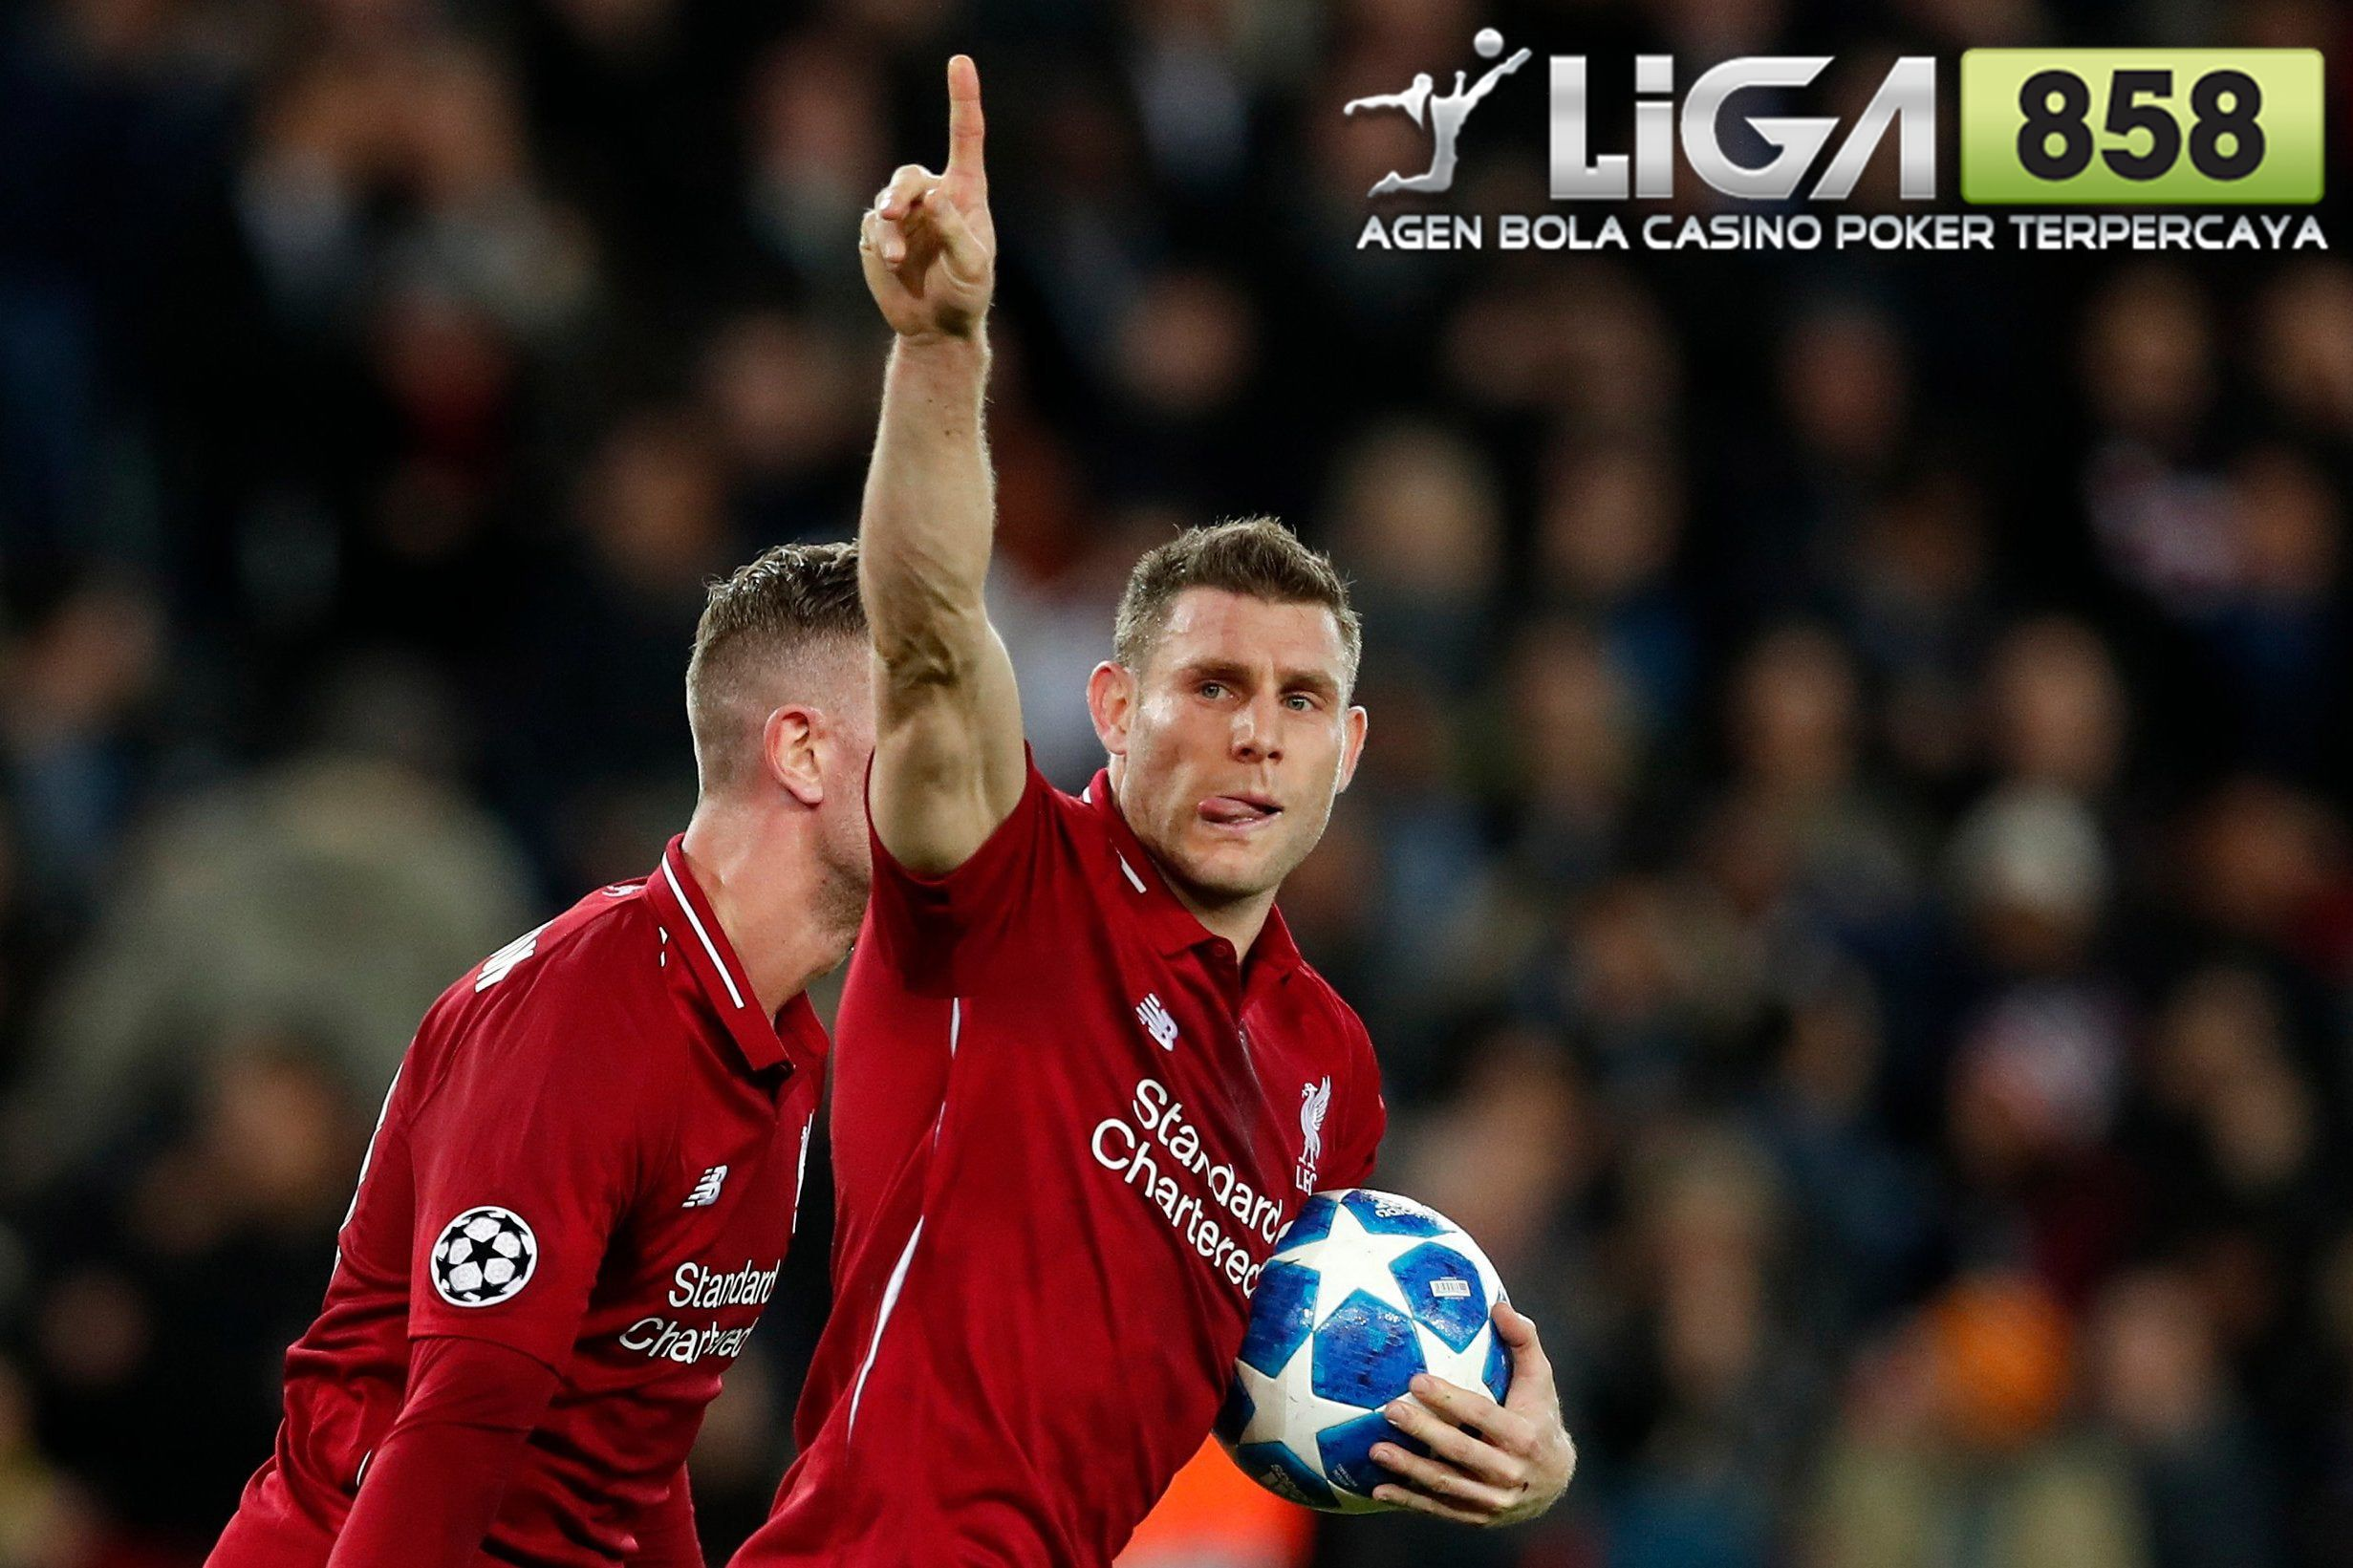 Dekati Gelandang Liverpool Baca Selengkapnya Www Bola858 Blogspot Com Dengan Gambar Liverpool Psg Manchester